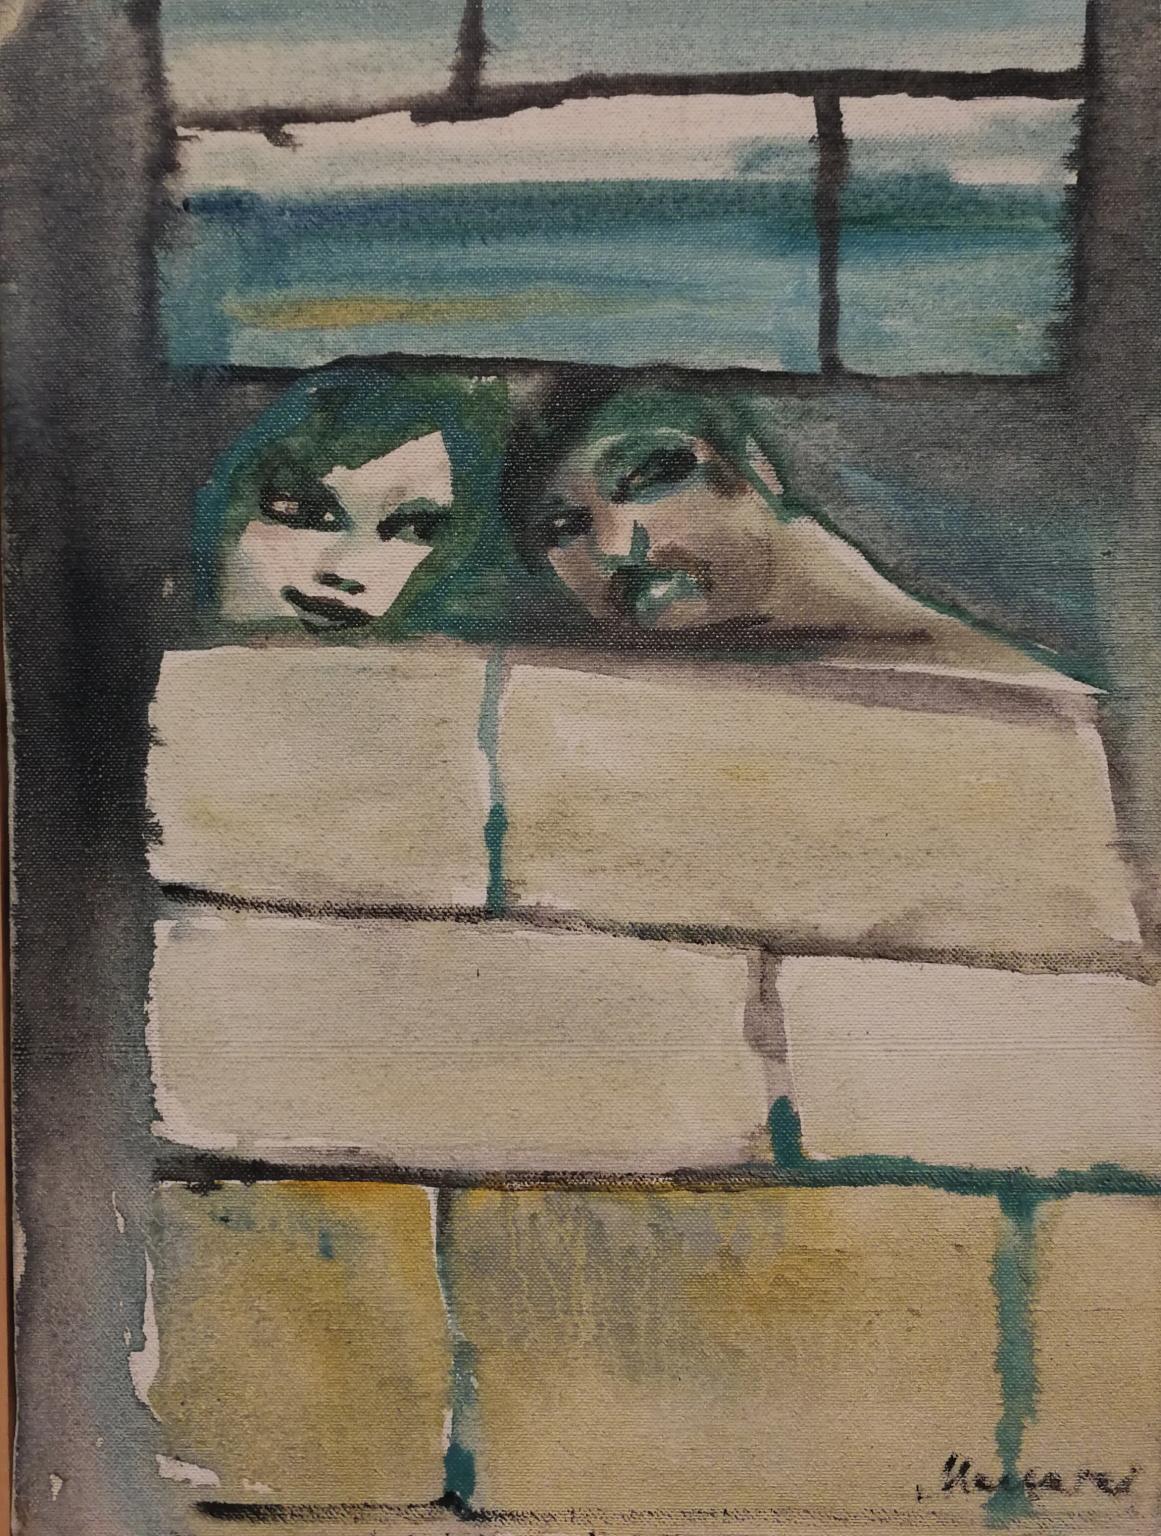 Signed M Maccari Post Impressionist Figurative Painting 1970s oil canvas